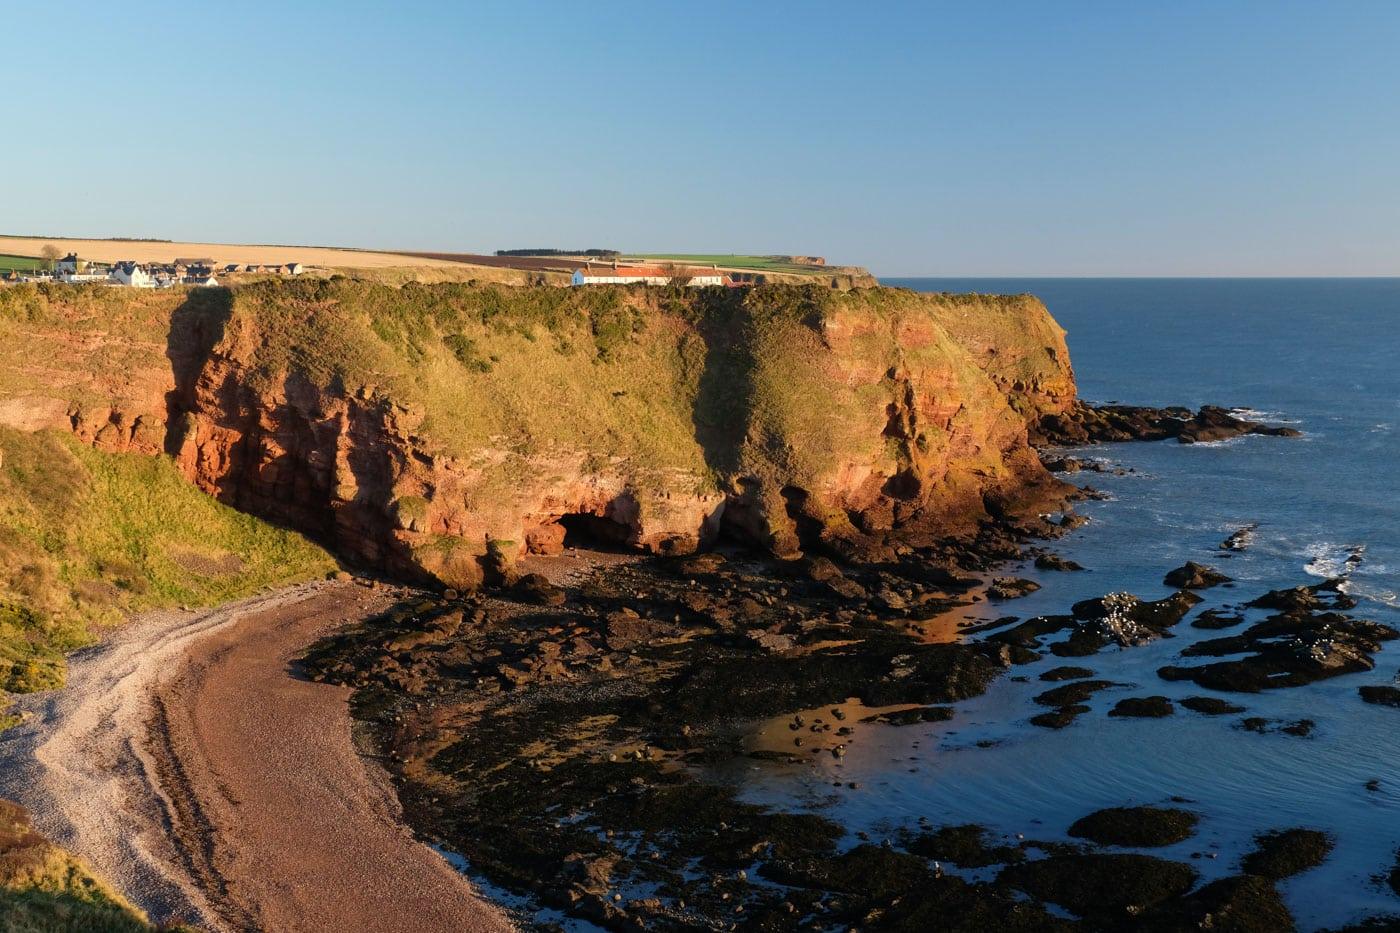 seaton cliffs arbroath